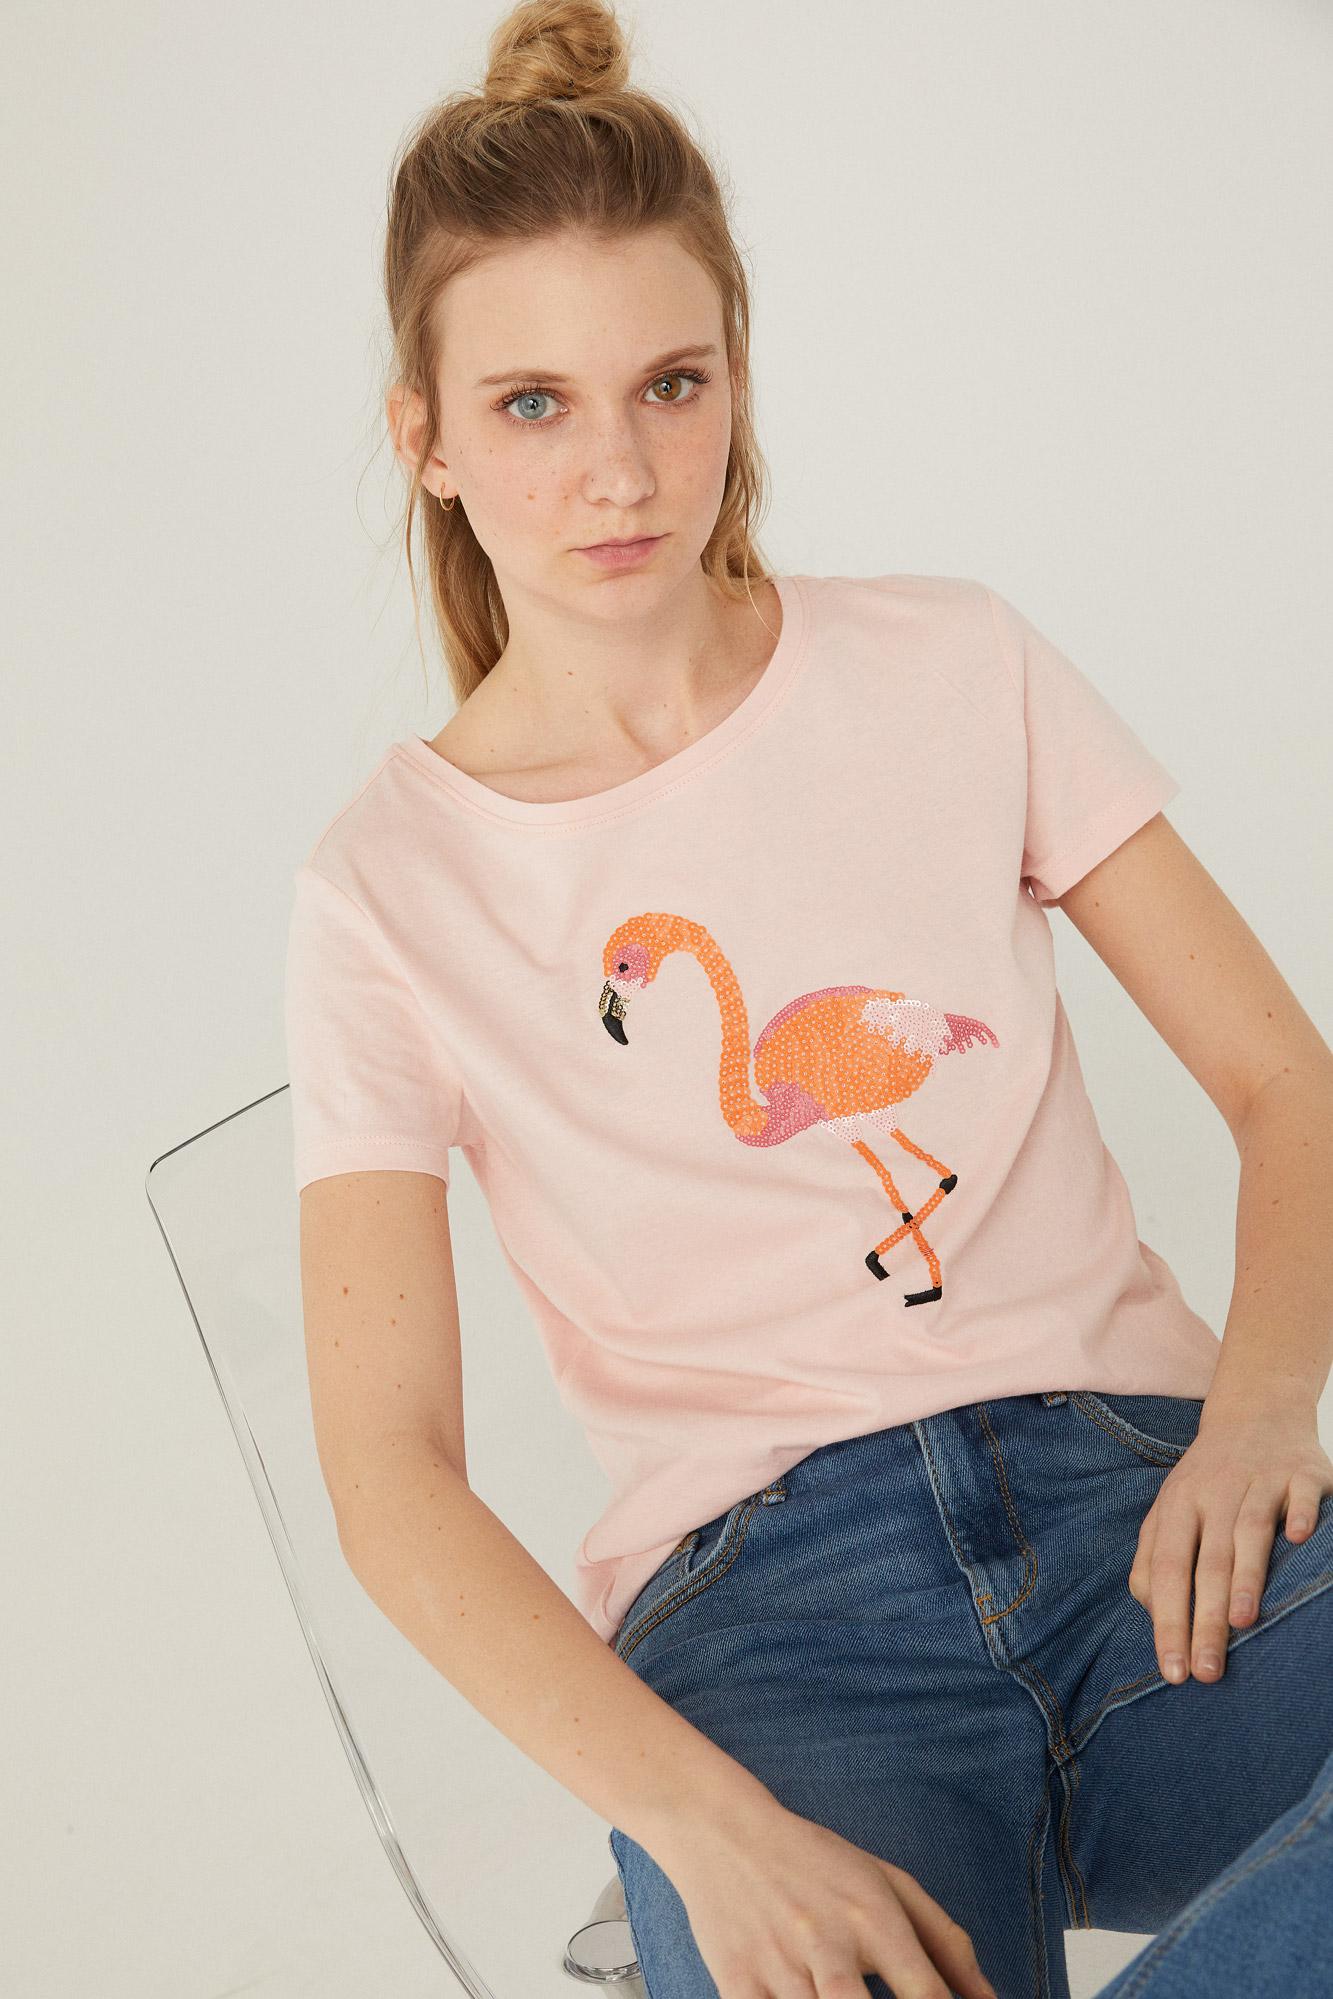 Camiseta estampado gráfico lentejuelas